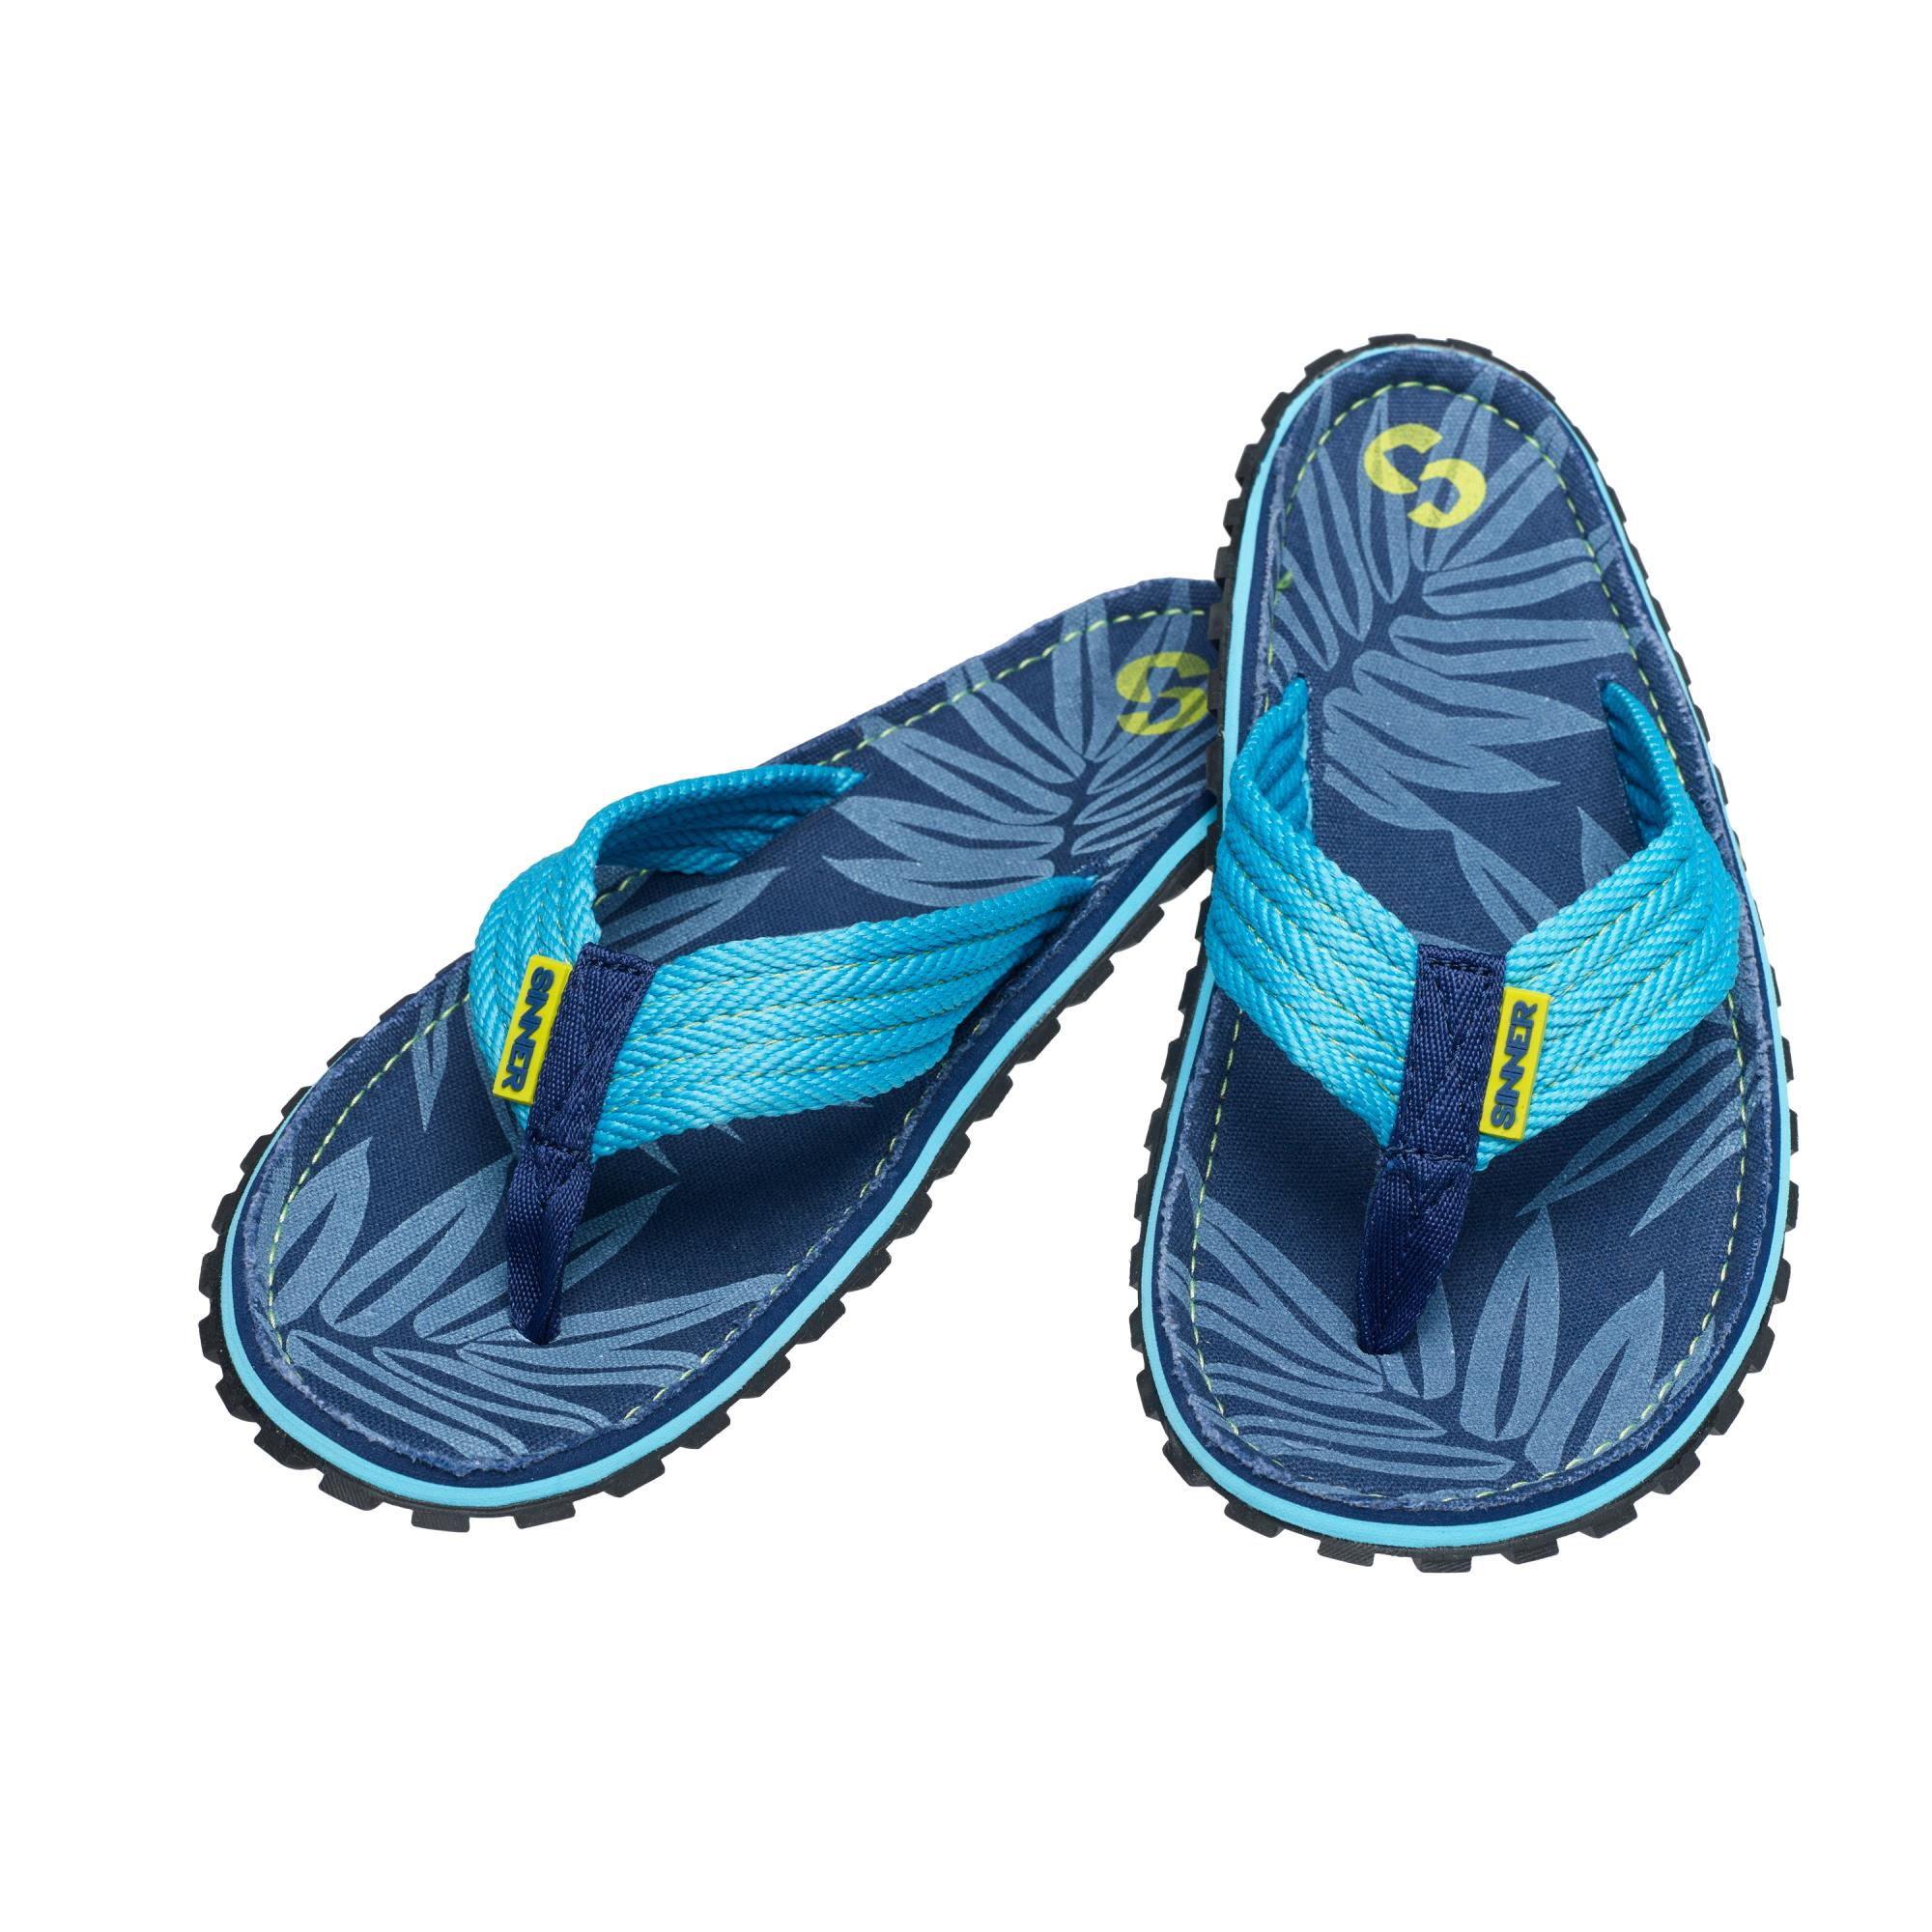 Sinner Beach Slaps Iiii Slippers - Donkerblauw - 43